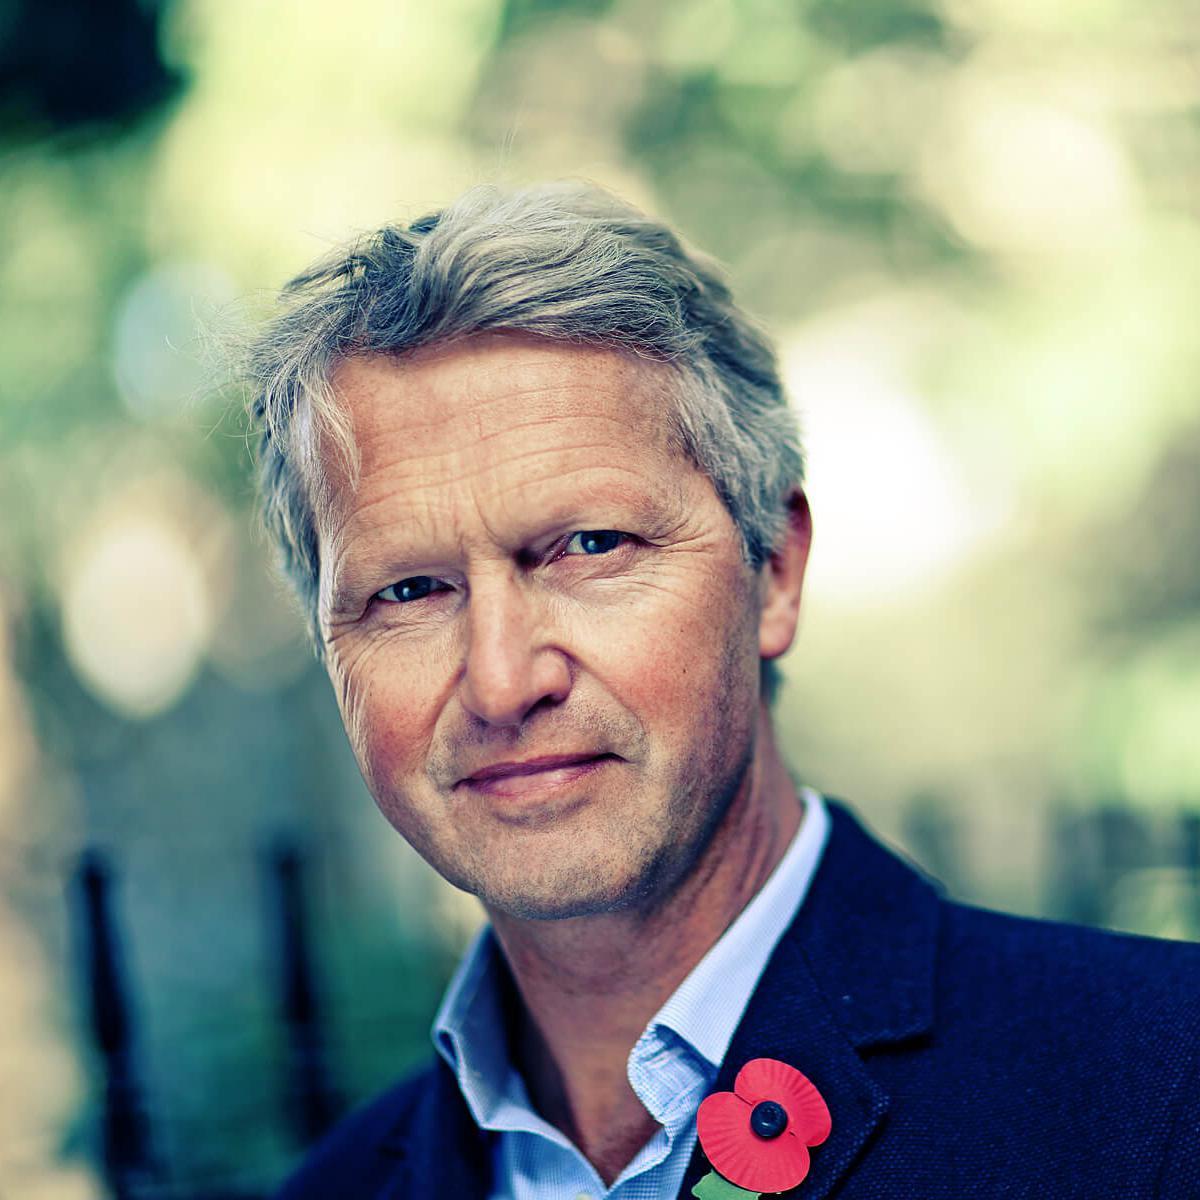 Julian Hanson-Smith - a professional Linkedin headshot photograph by Julian Hanford, London